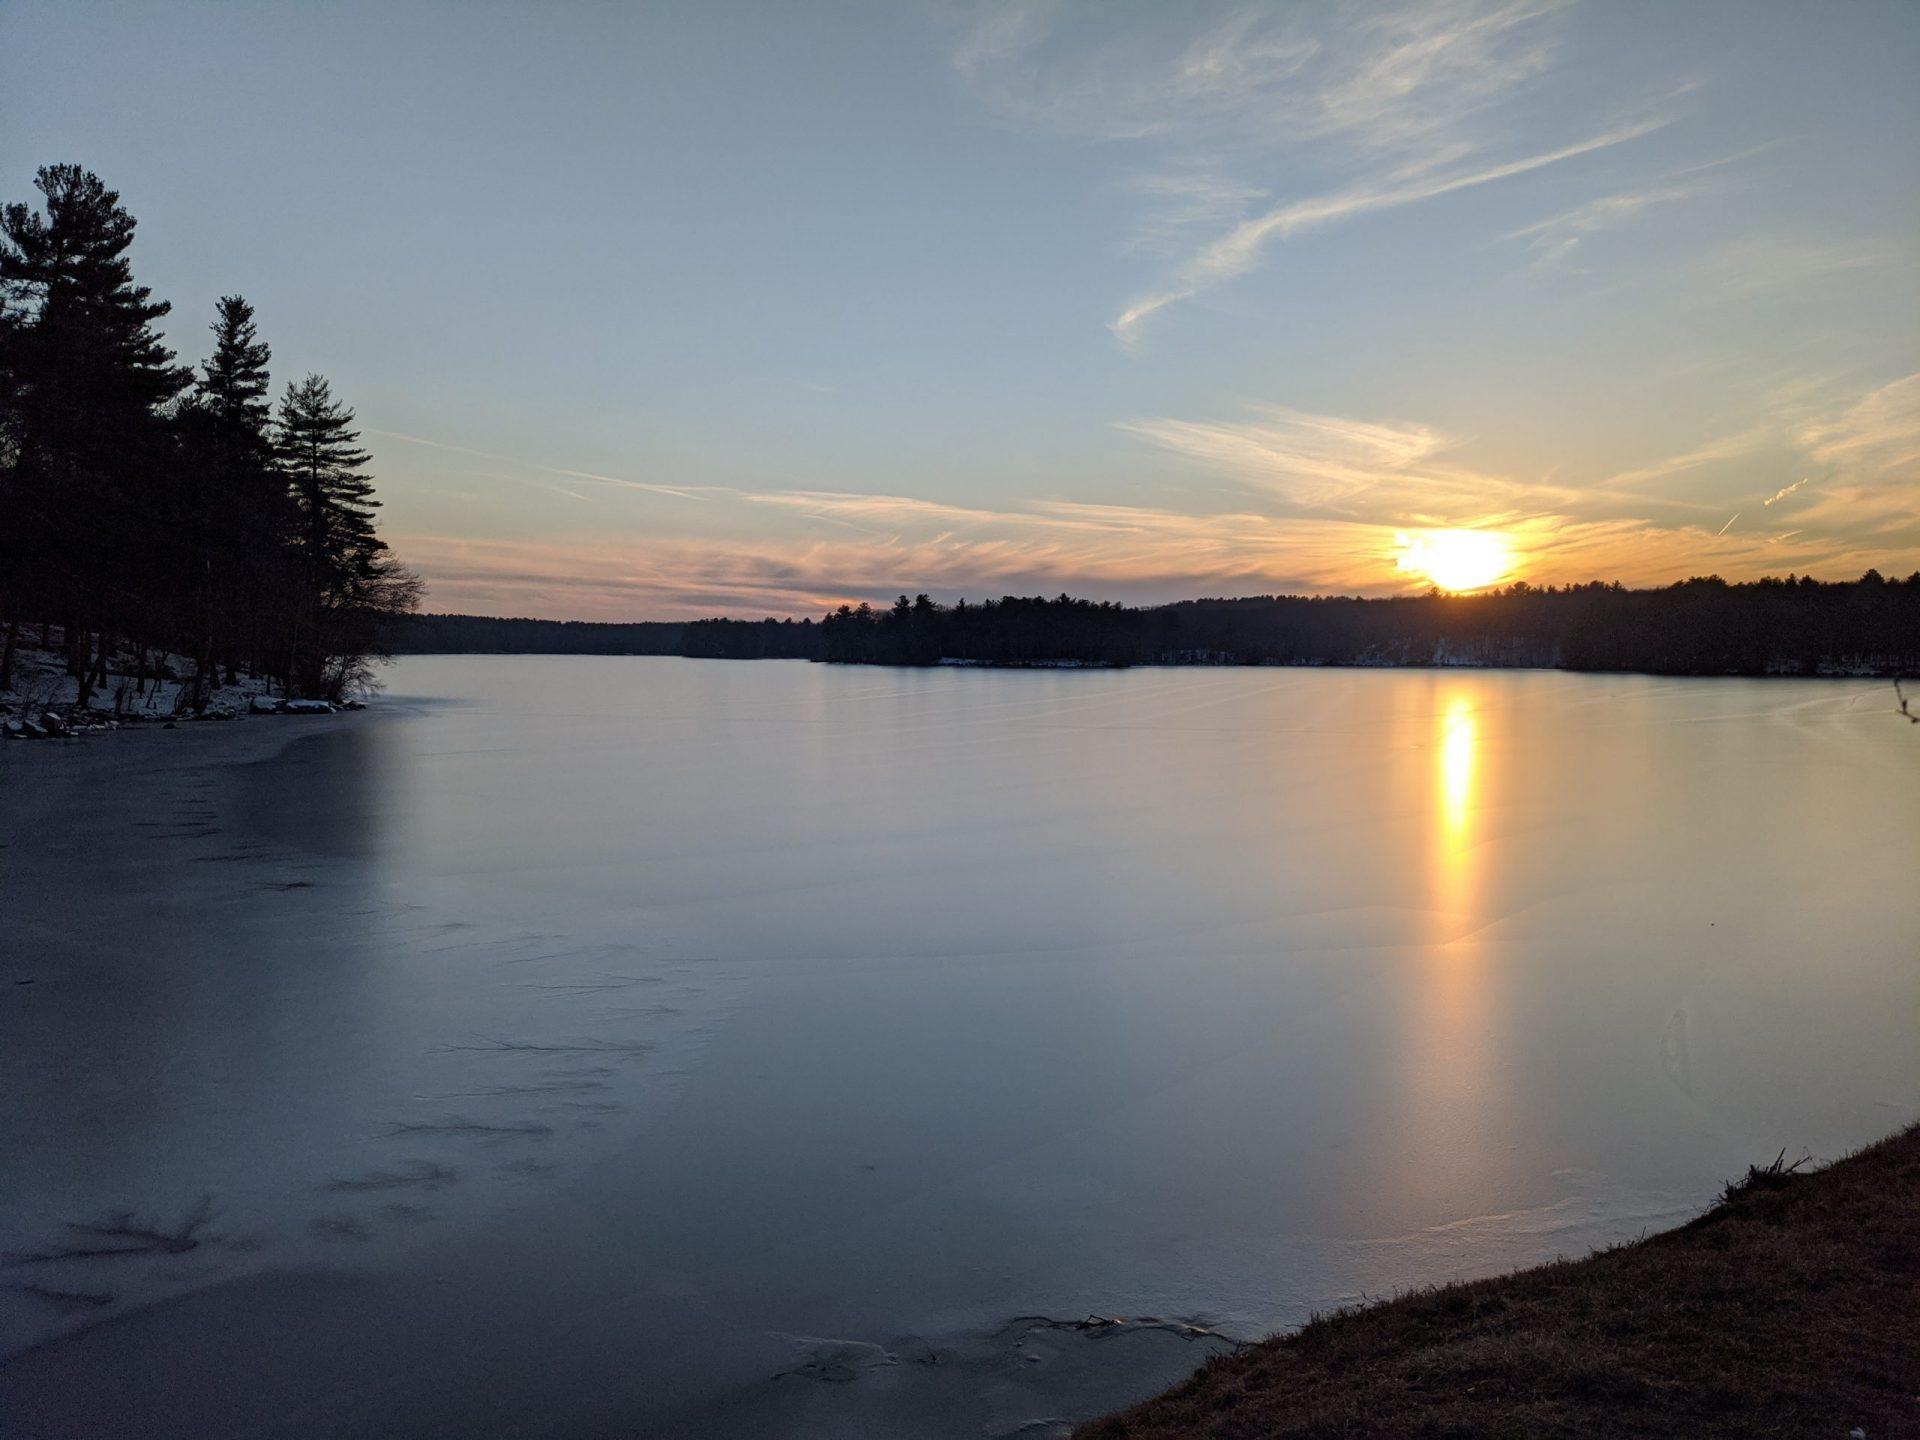 Sunset on ice - Ashland Reservoir January 2020